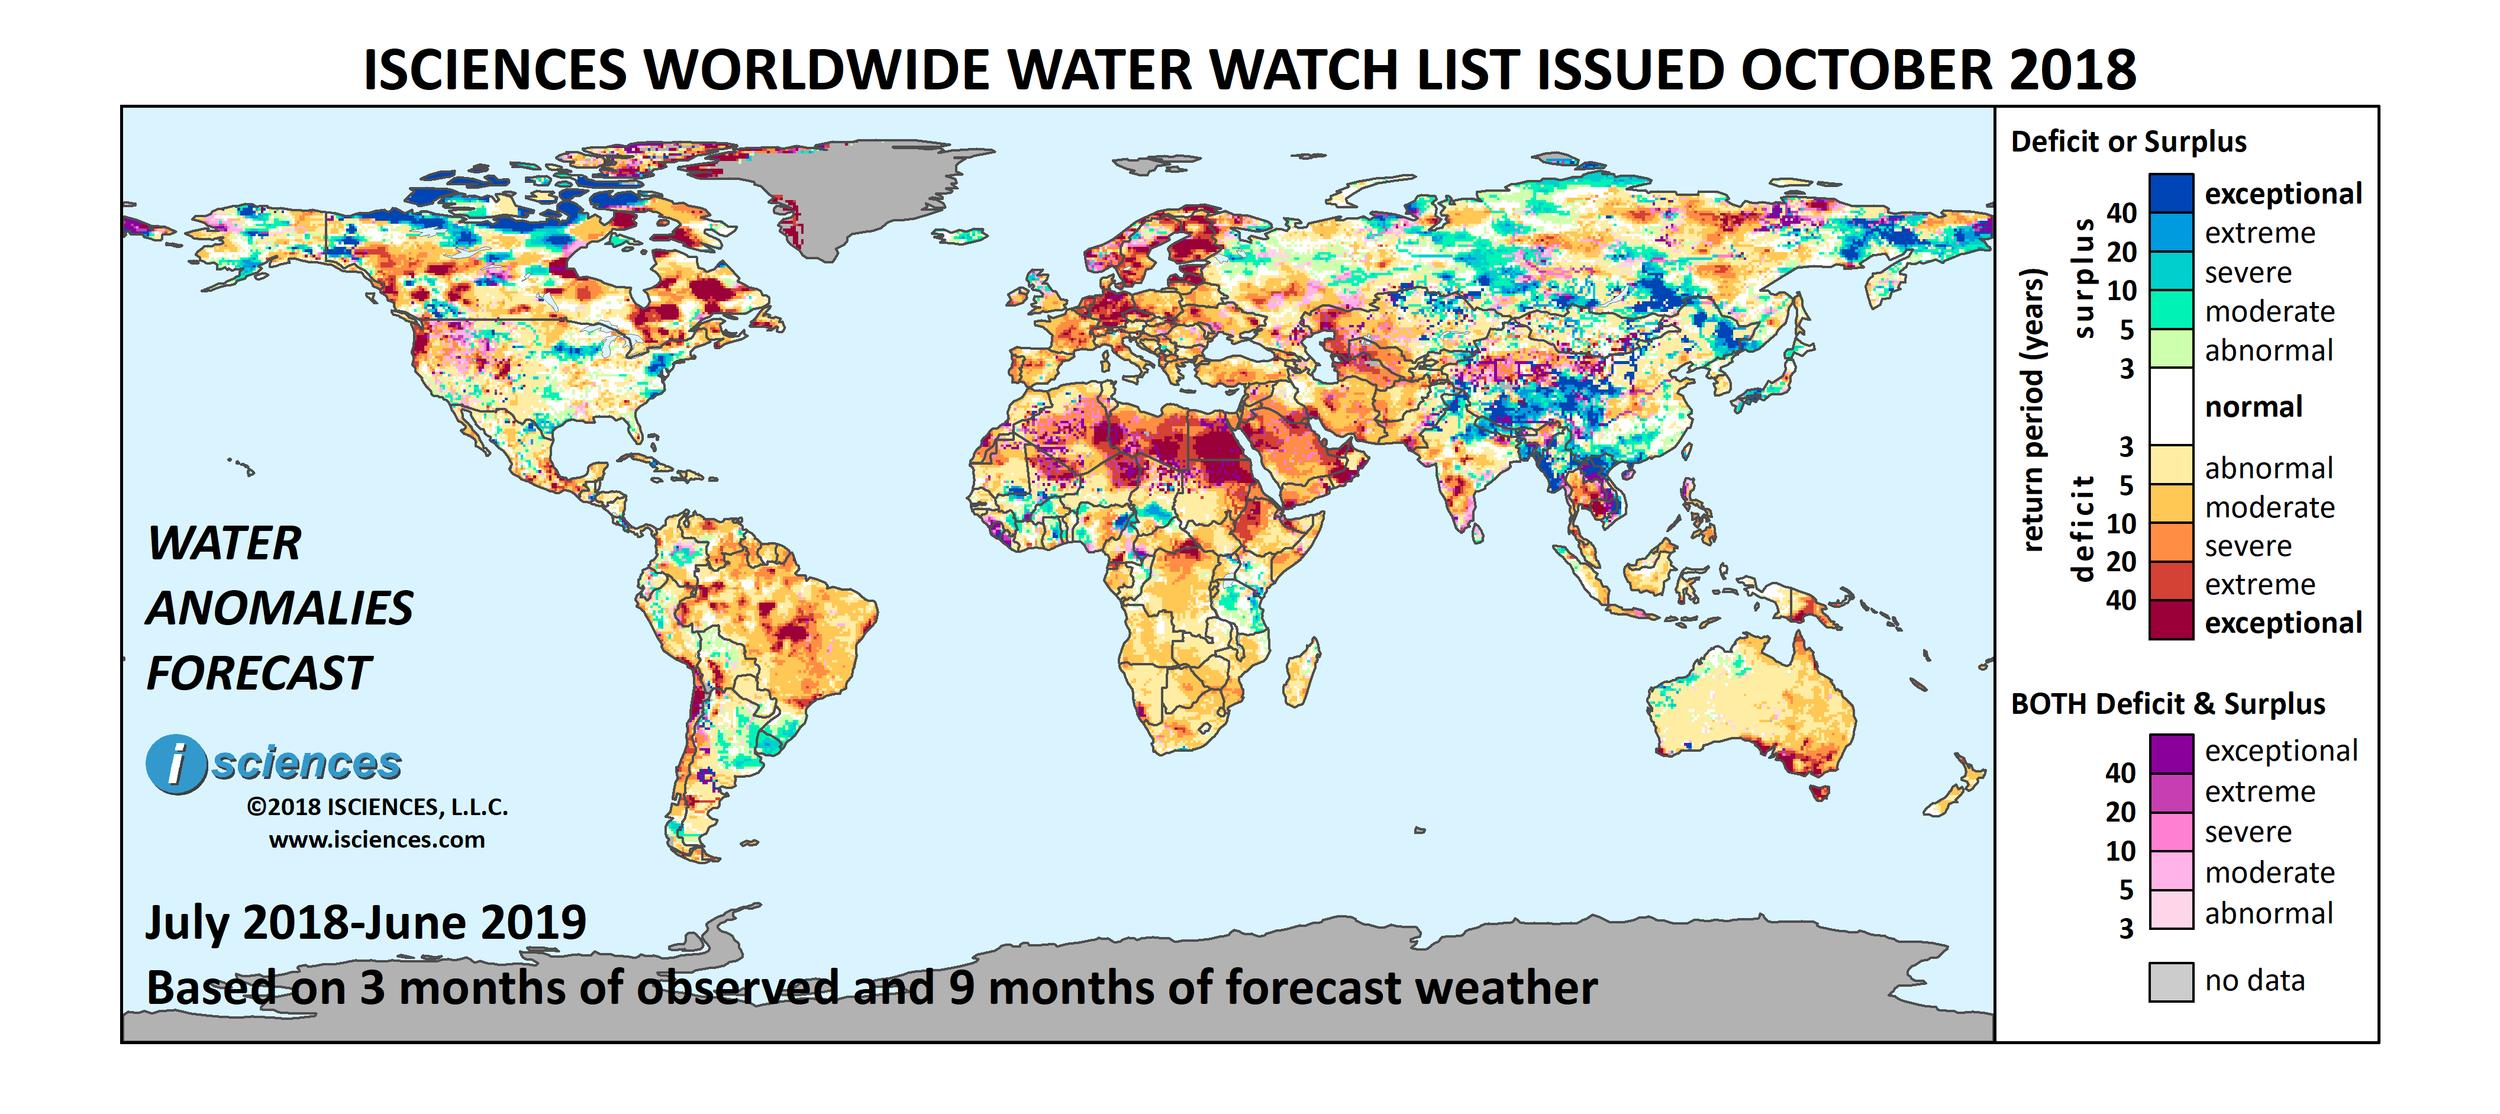 ISciences_Worldwide_Water_Watch_List_2018_October.png